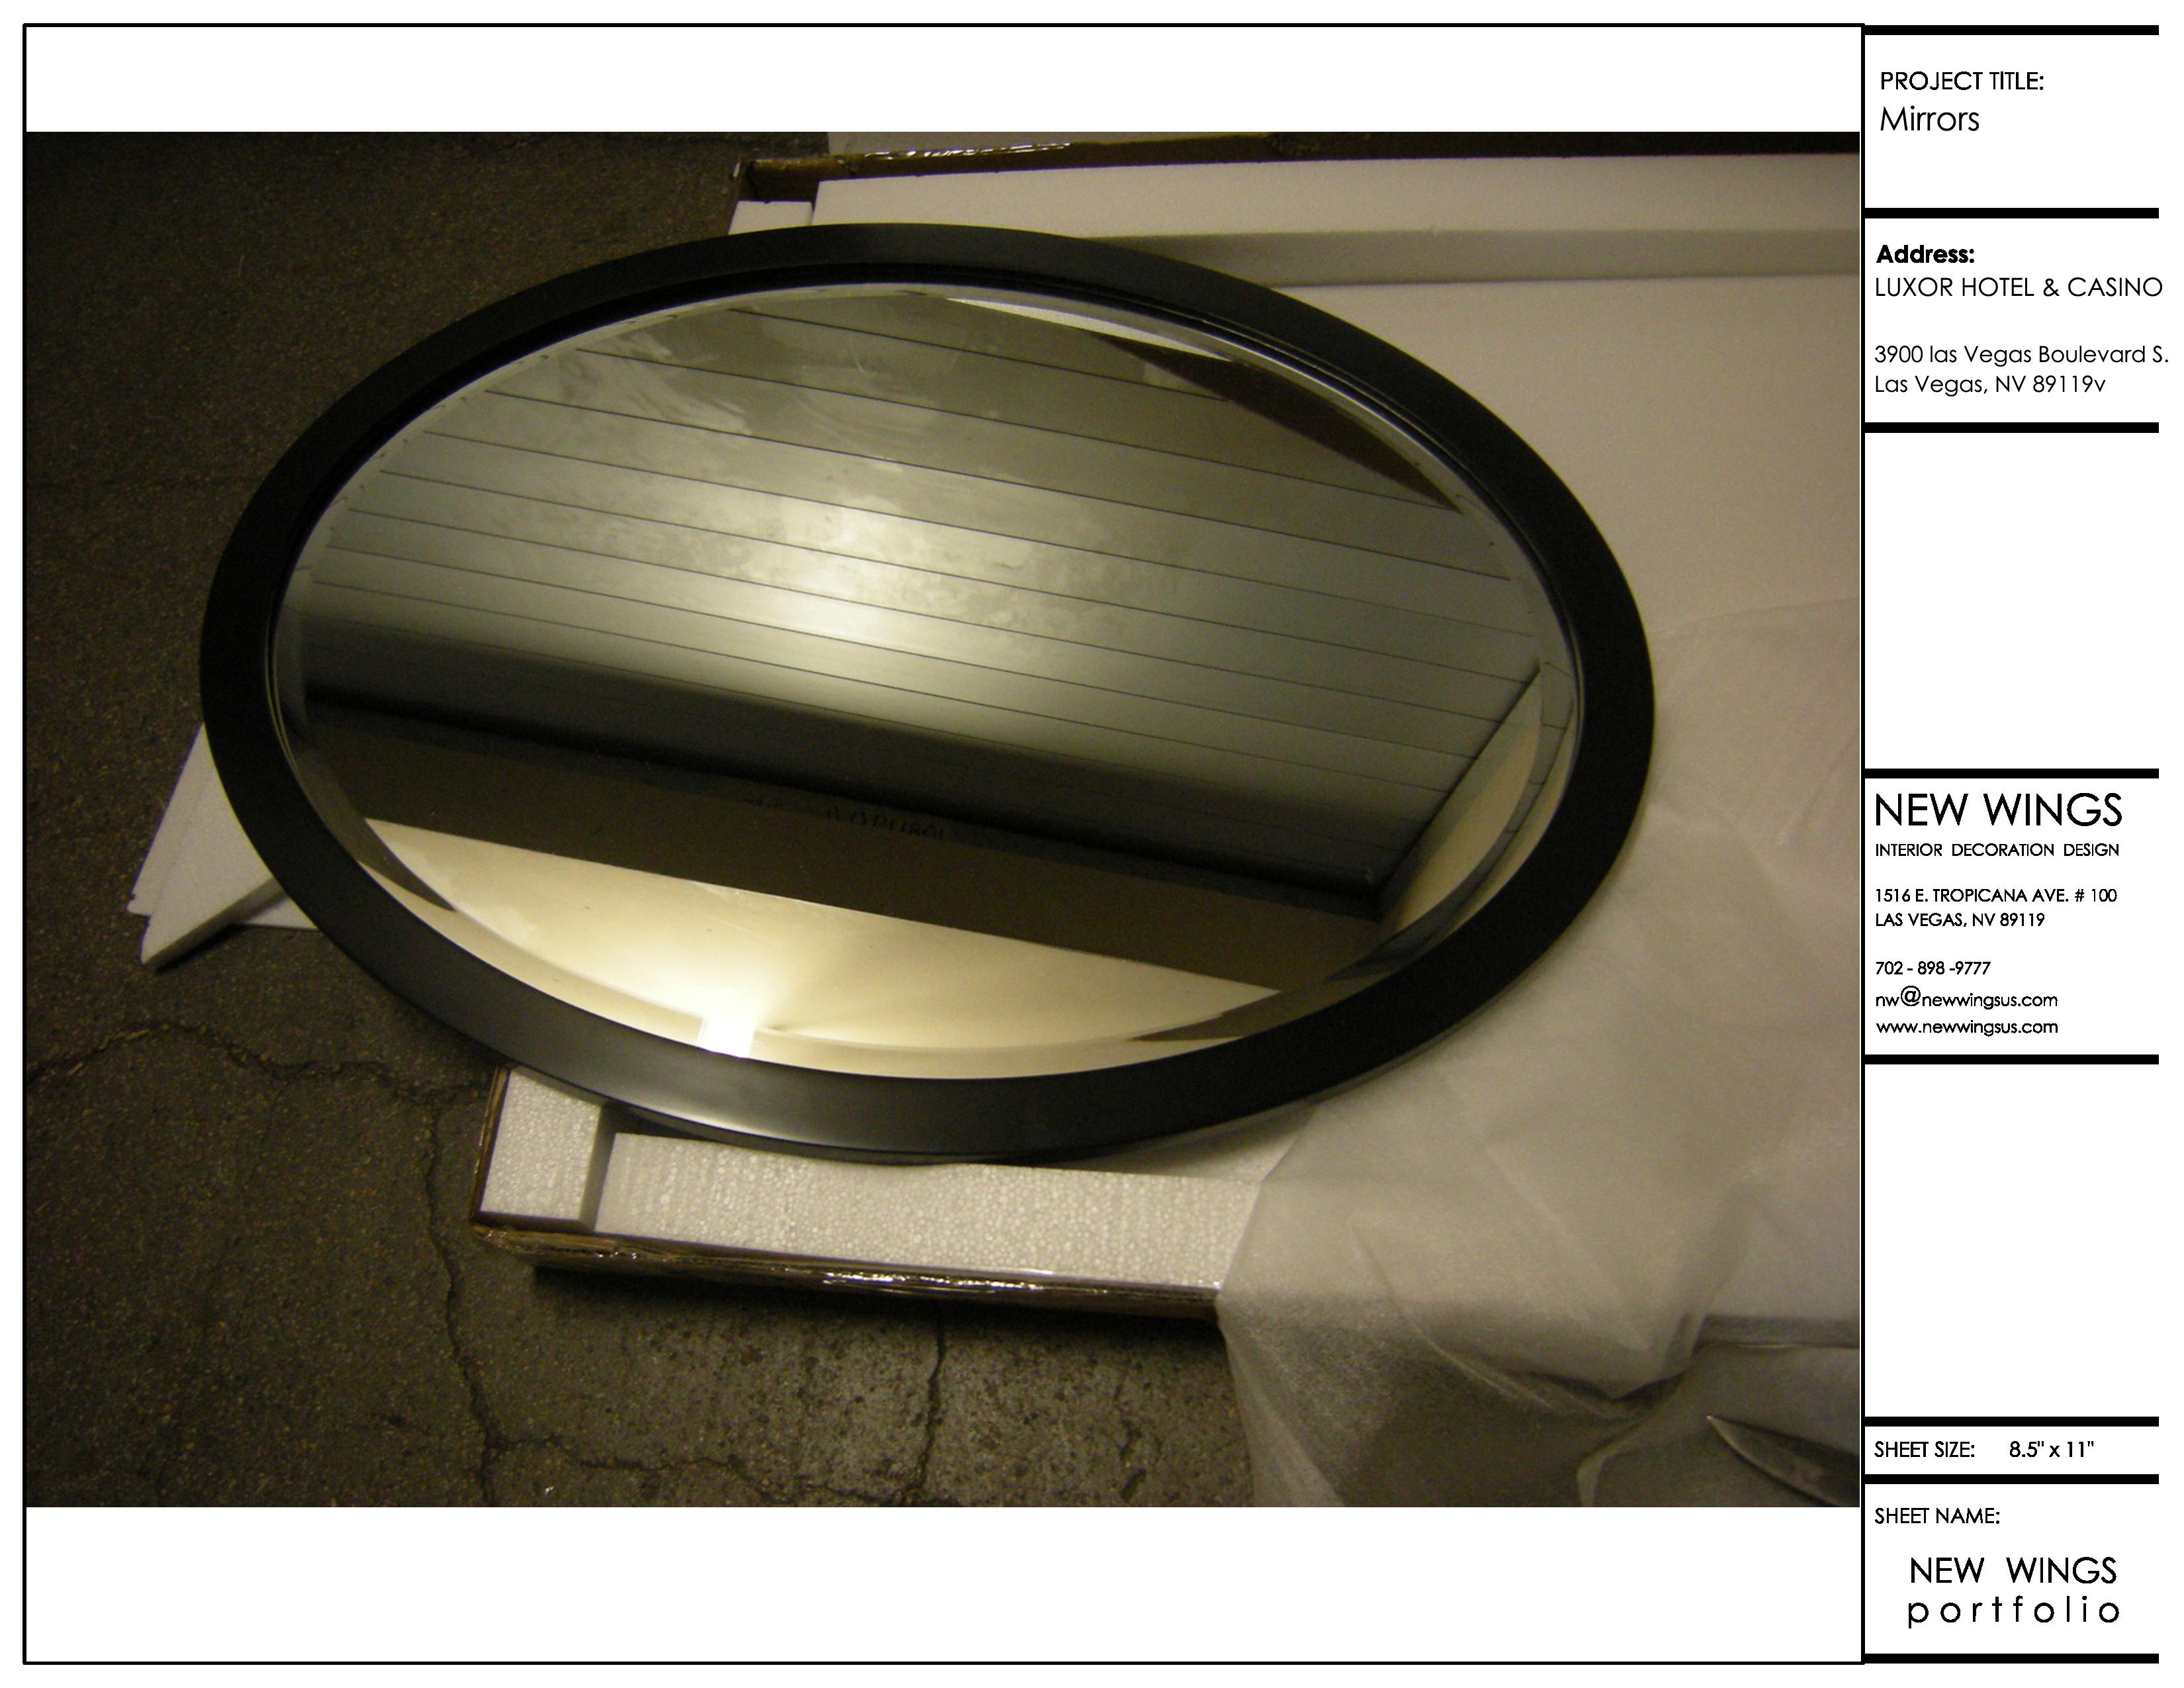 Custom-made Mirrors